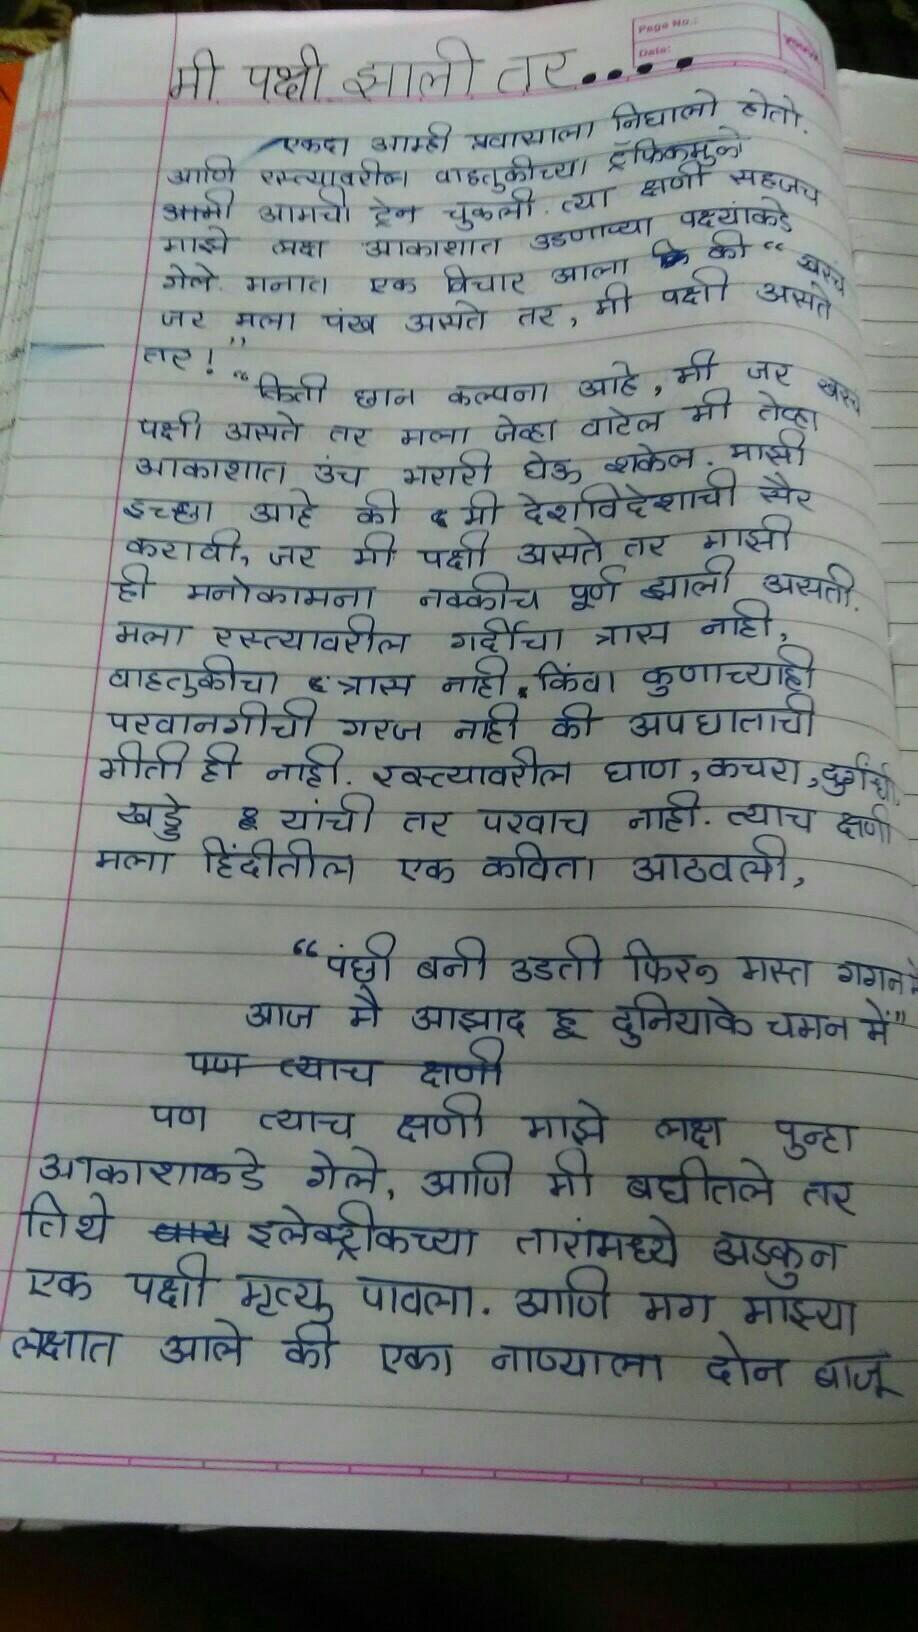 Essay in marathi mi pakshi zalo tar - Brainly in